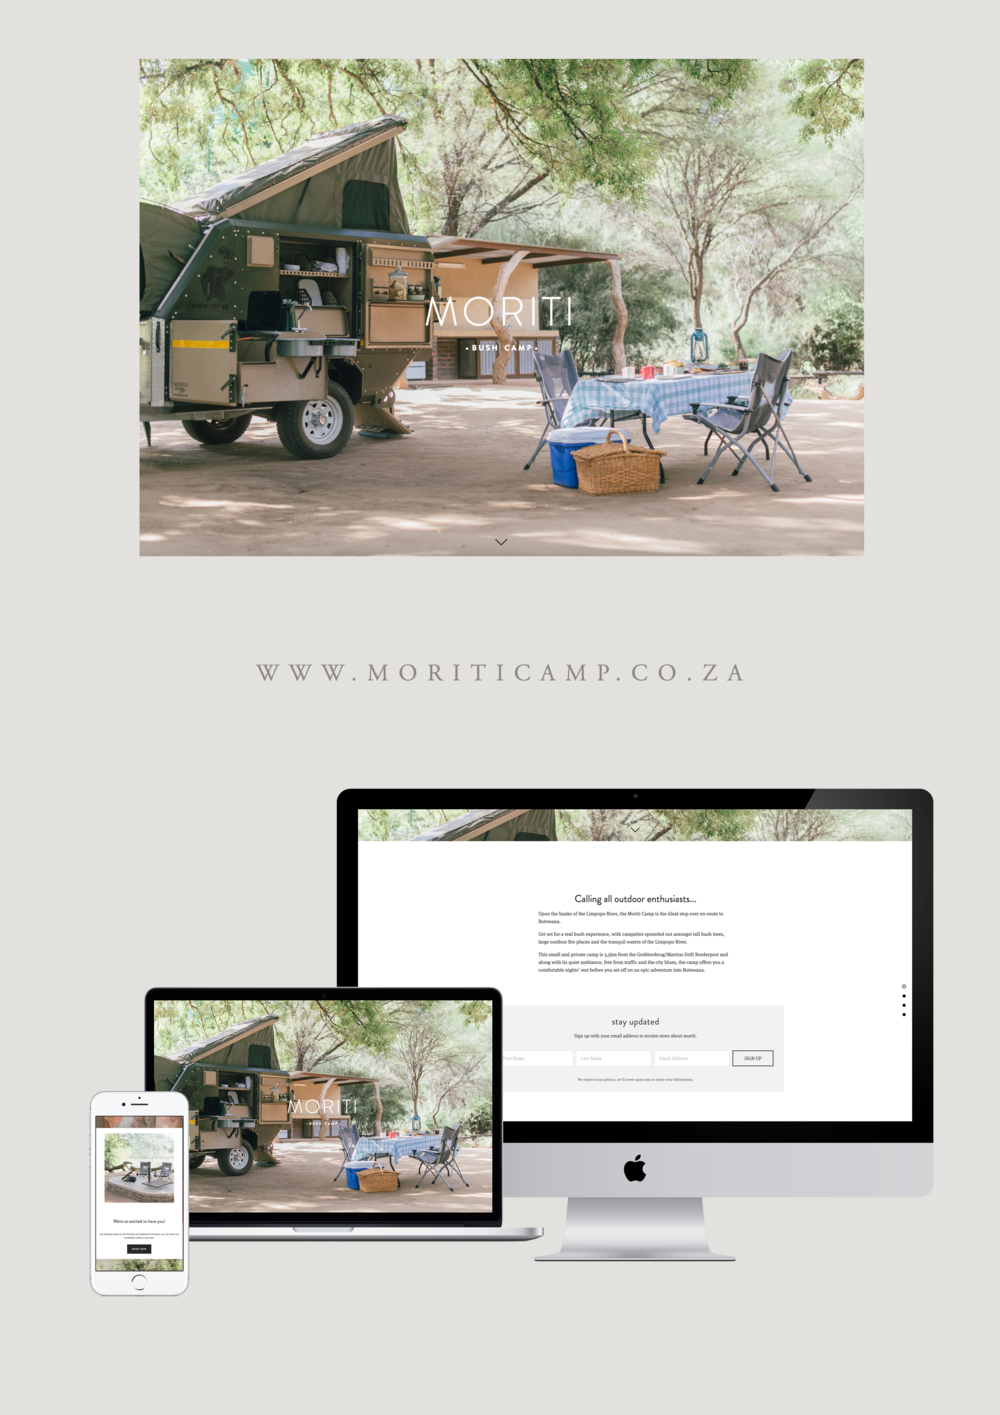 www.moriticamp.co.za